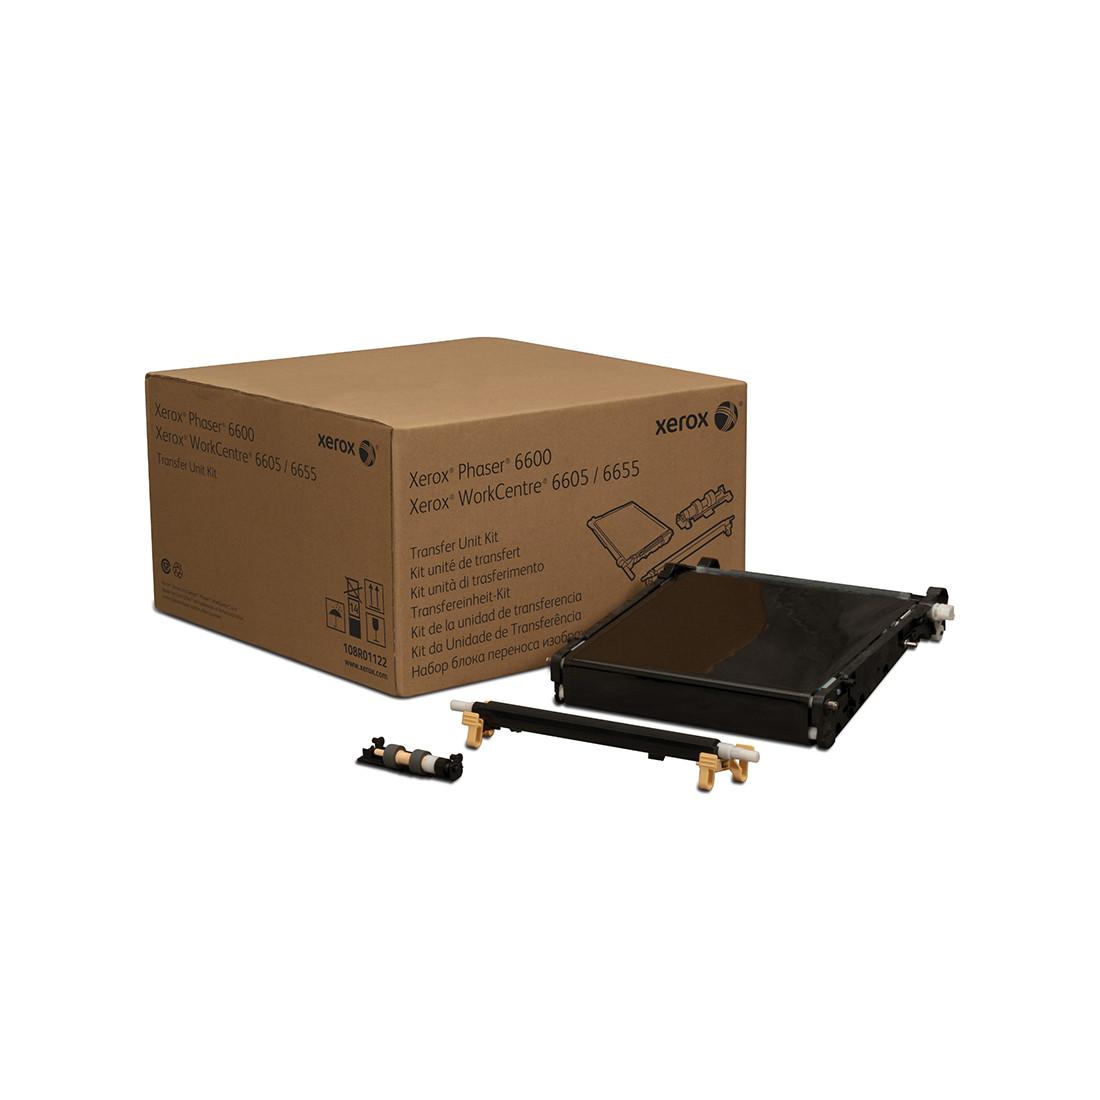 Комплект обслуживания, Xerox, 108R01122, Для Xerox Phaser 6600, WorkCentre 6605/6655, VersaLink